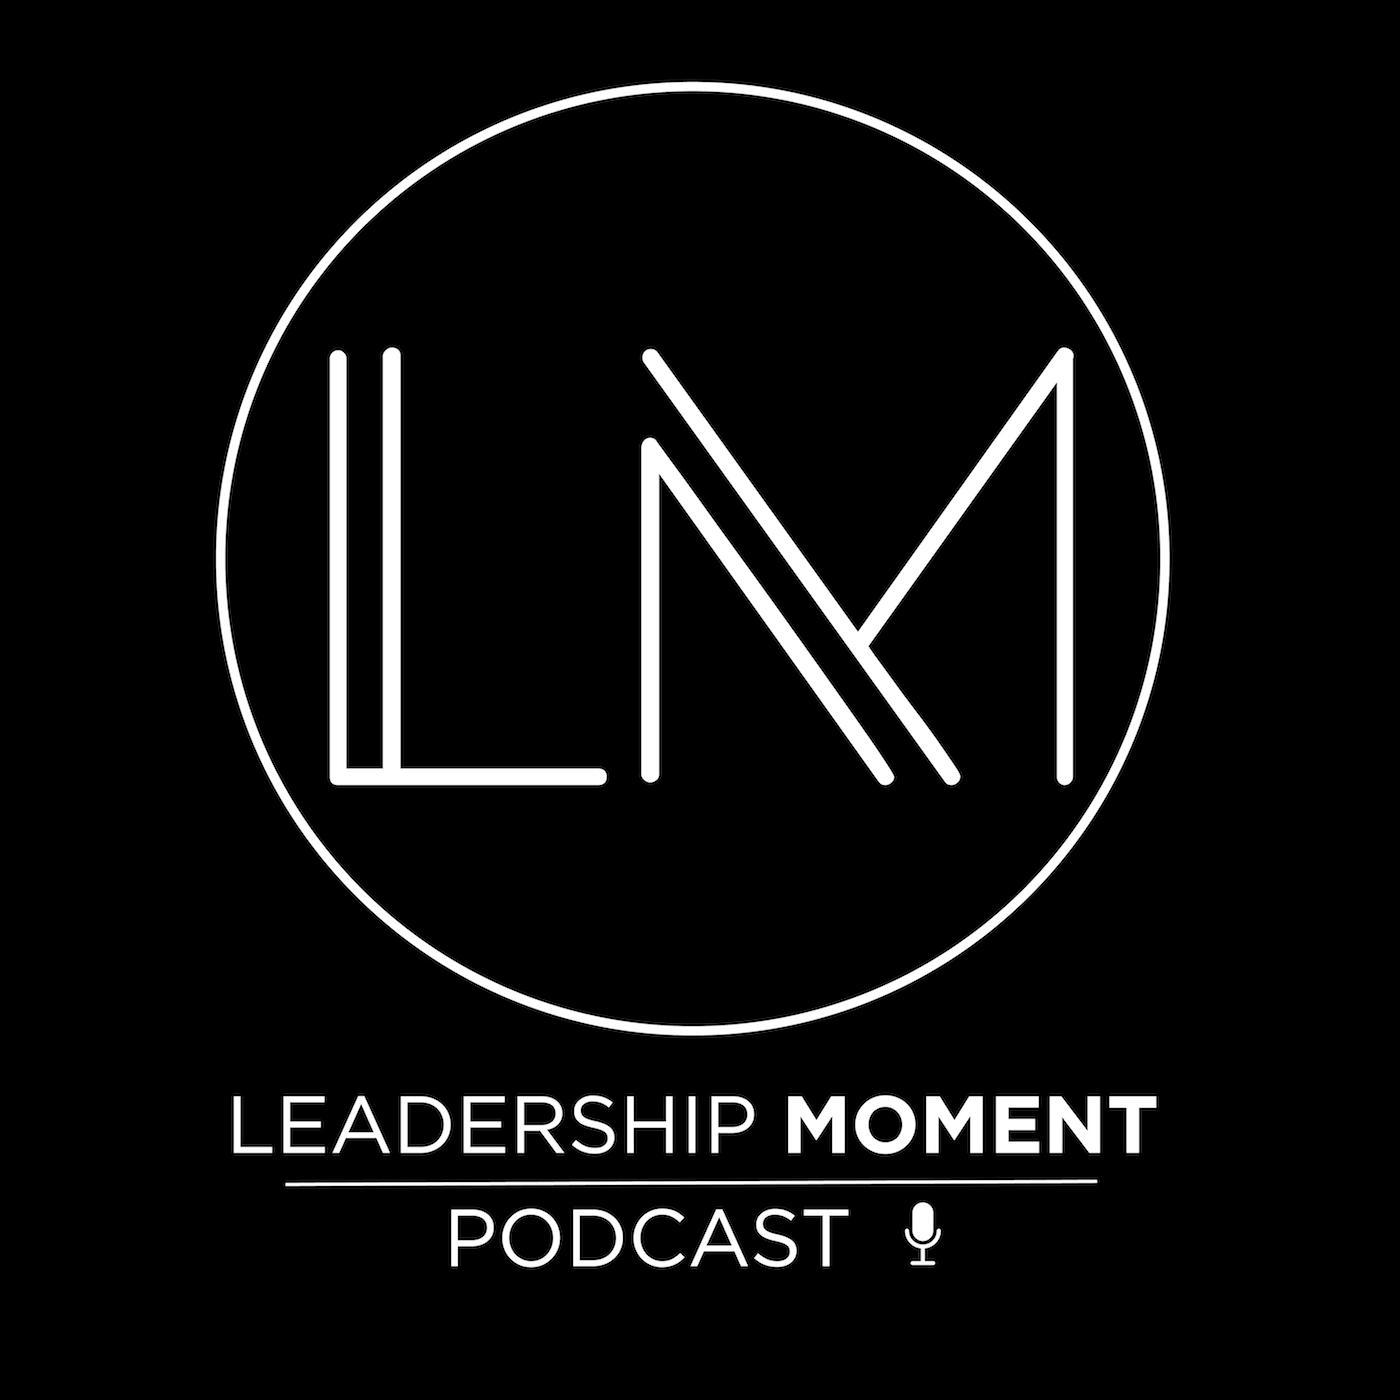 The Key to True Transformational Leadership - LM0217